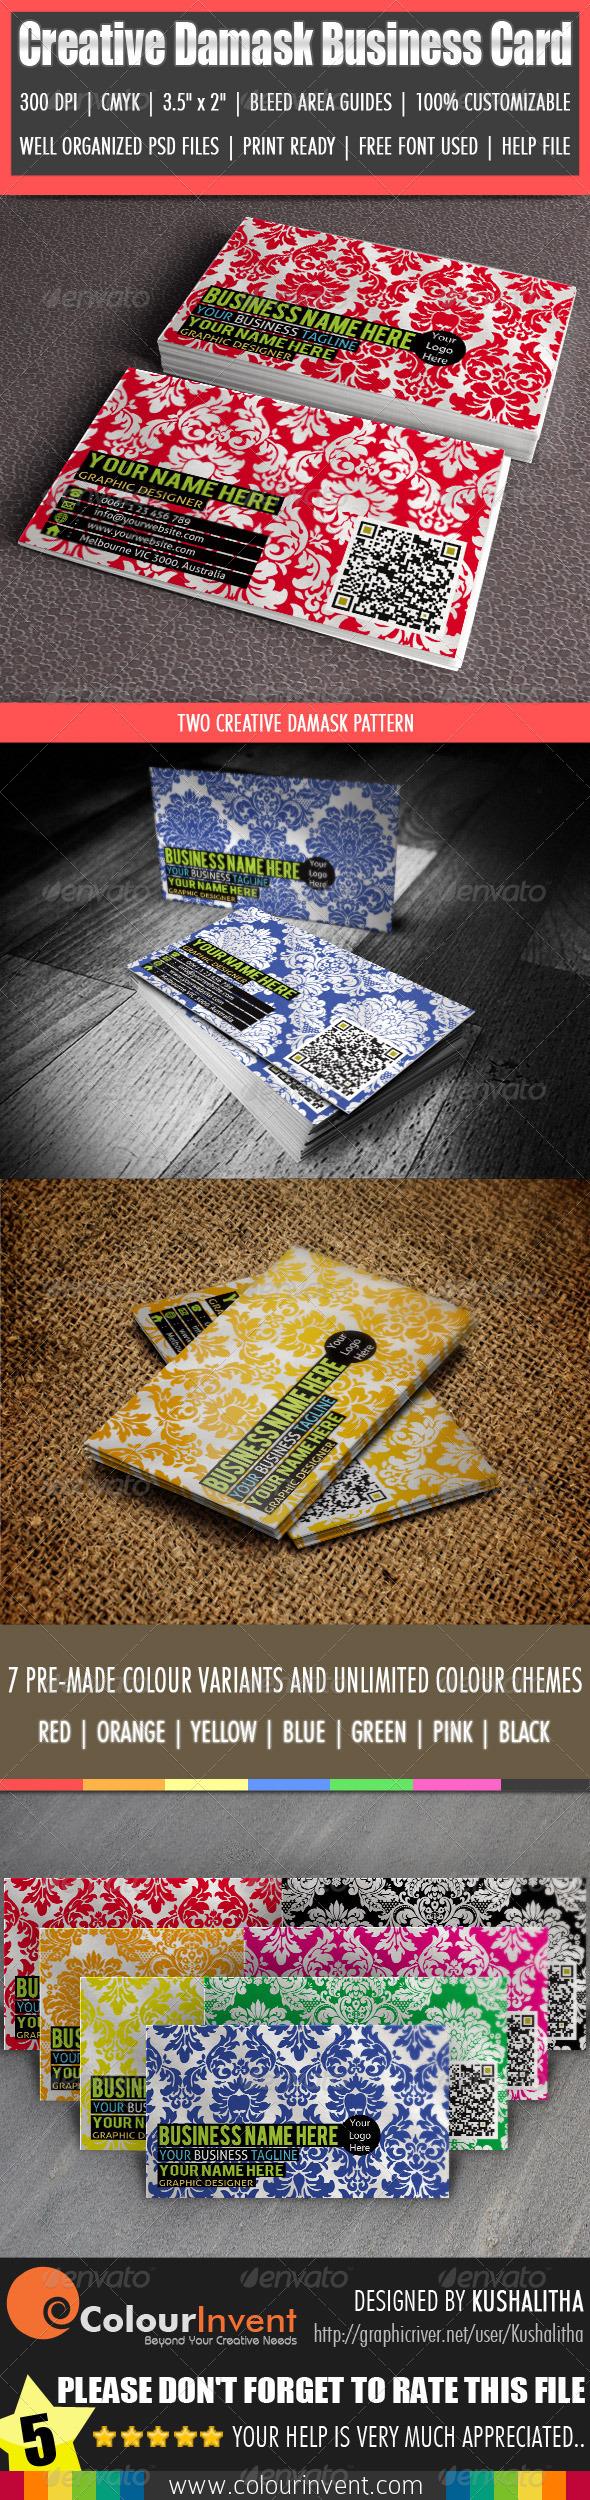 Creative Damask Business Card - Creative Business Cards